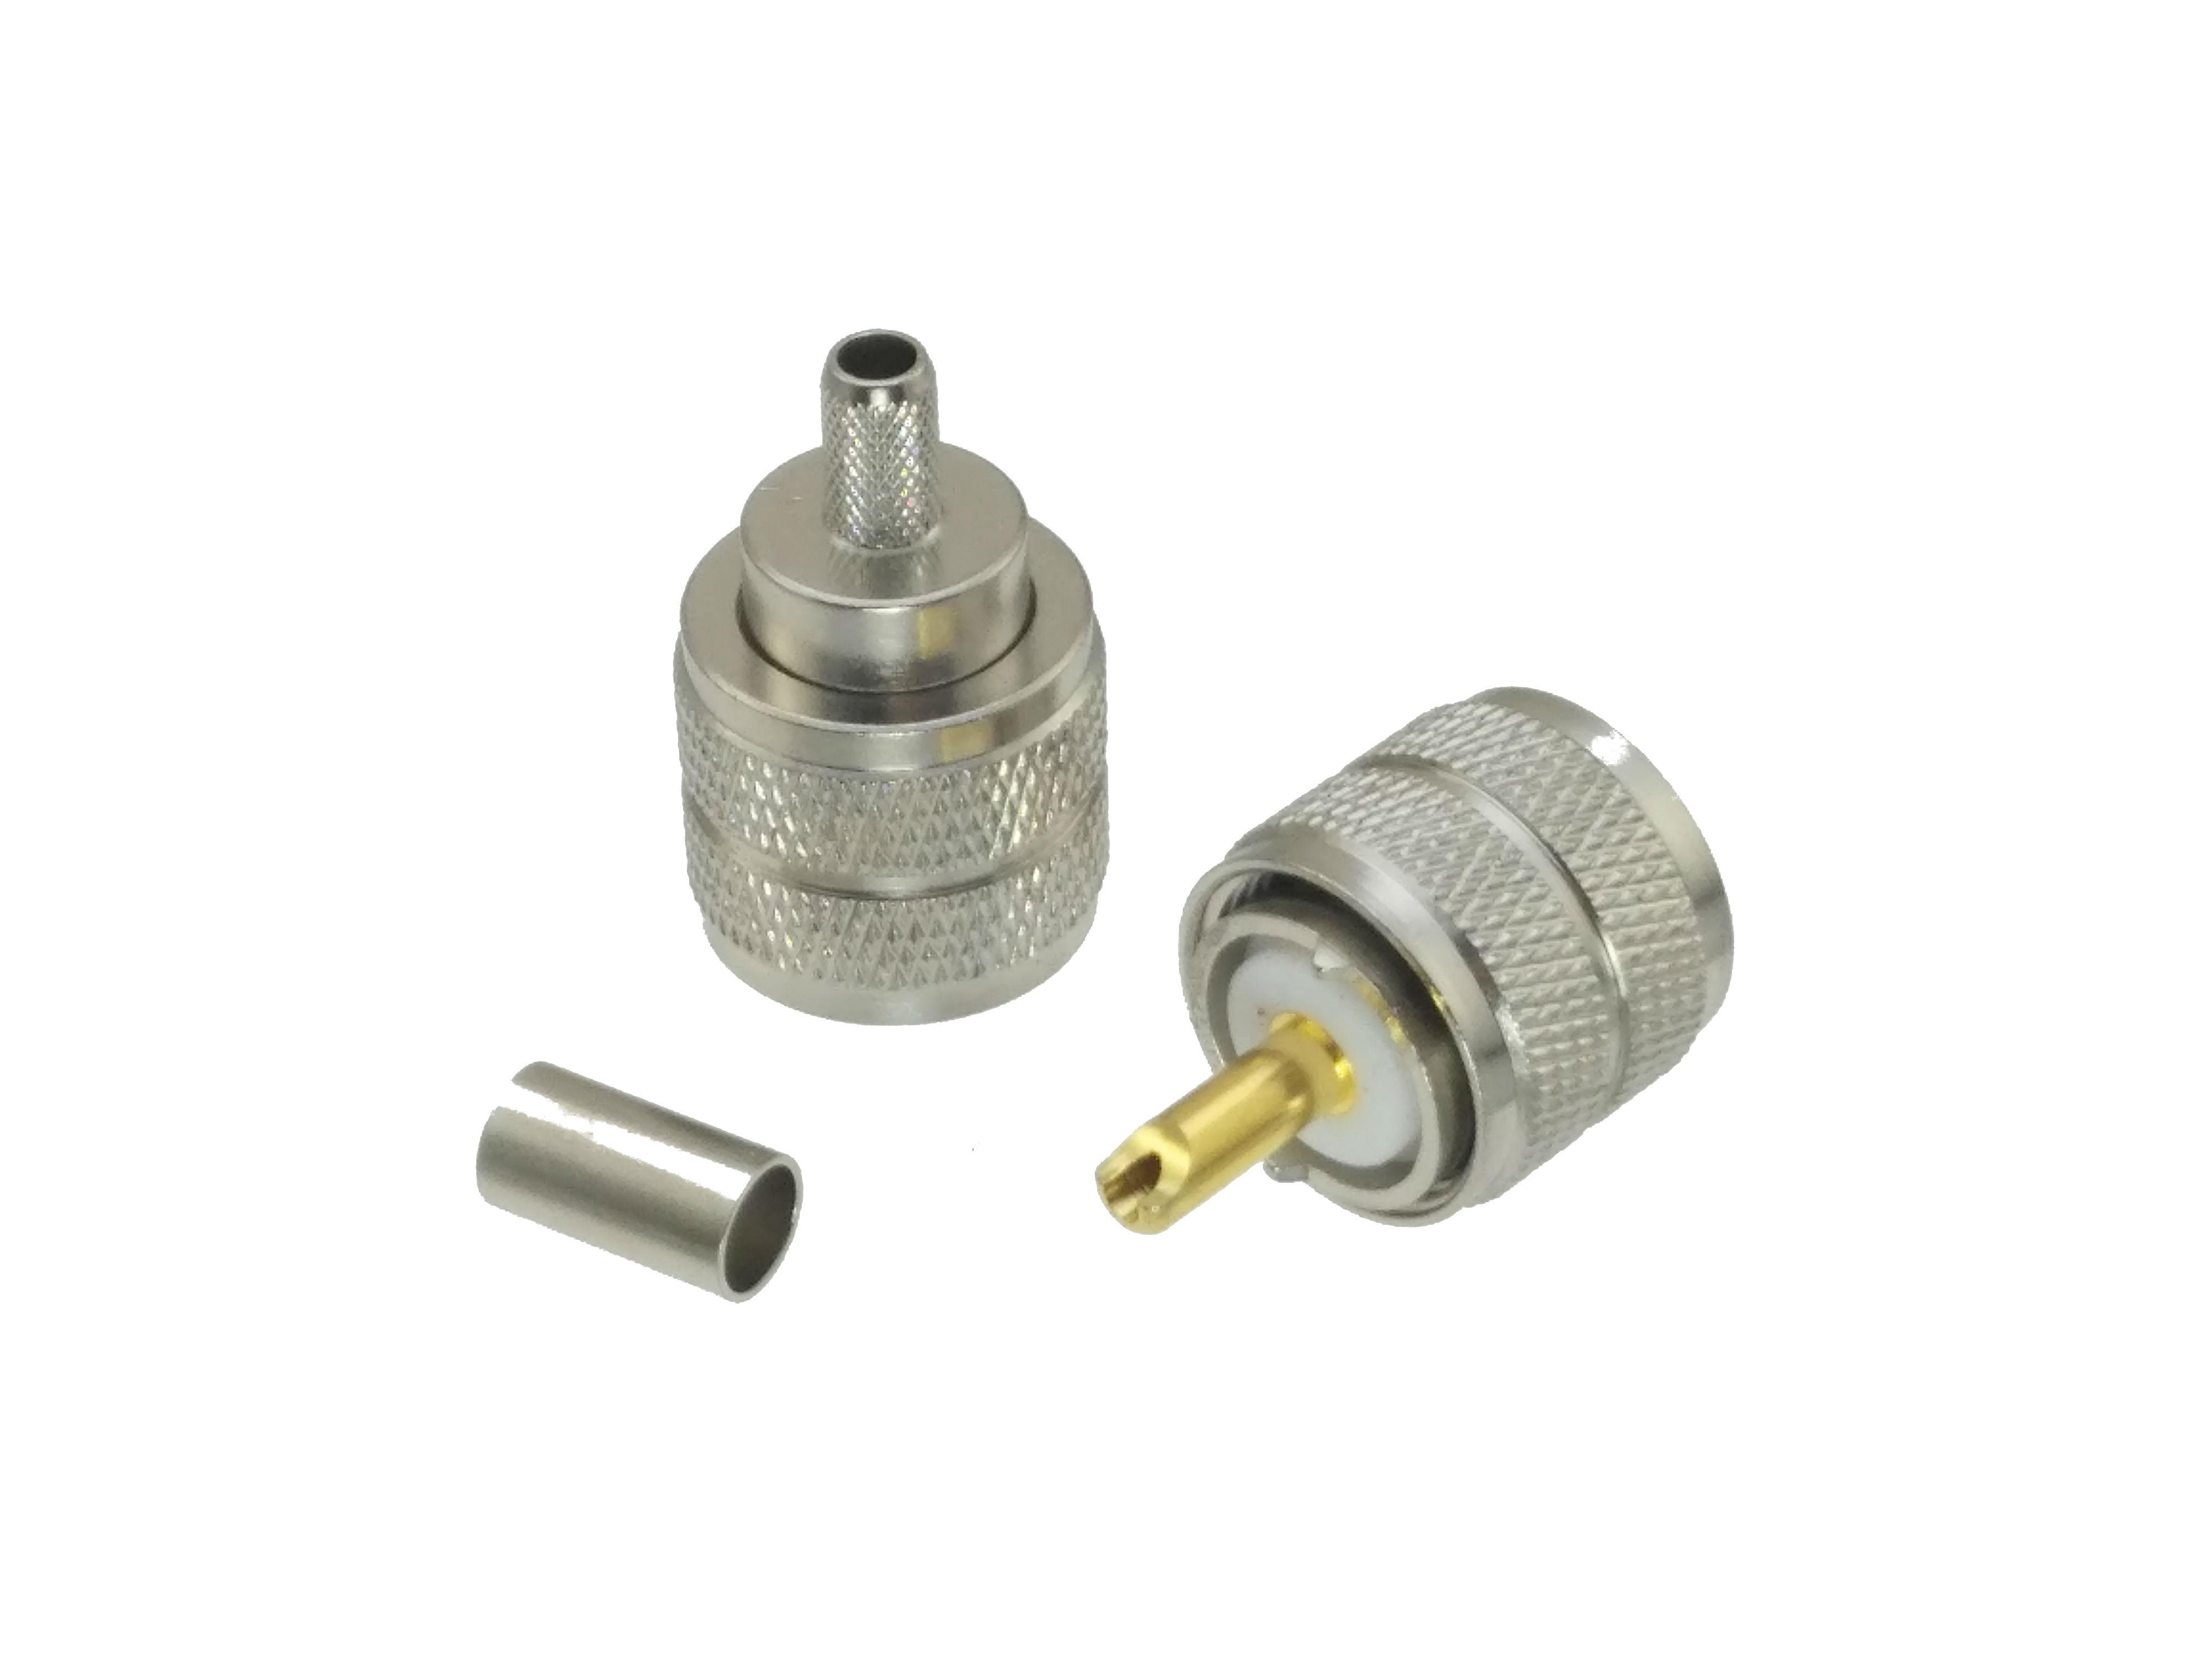 Connector UHF Male PL259 Plug Crimp RG58 RG142 LMR195 RG400 Cable Straight